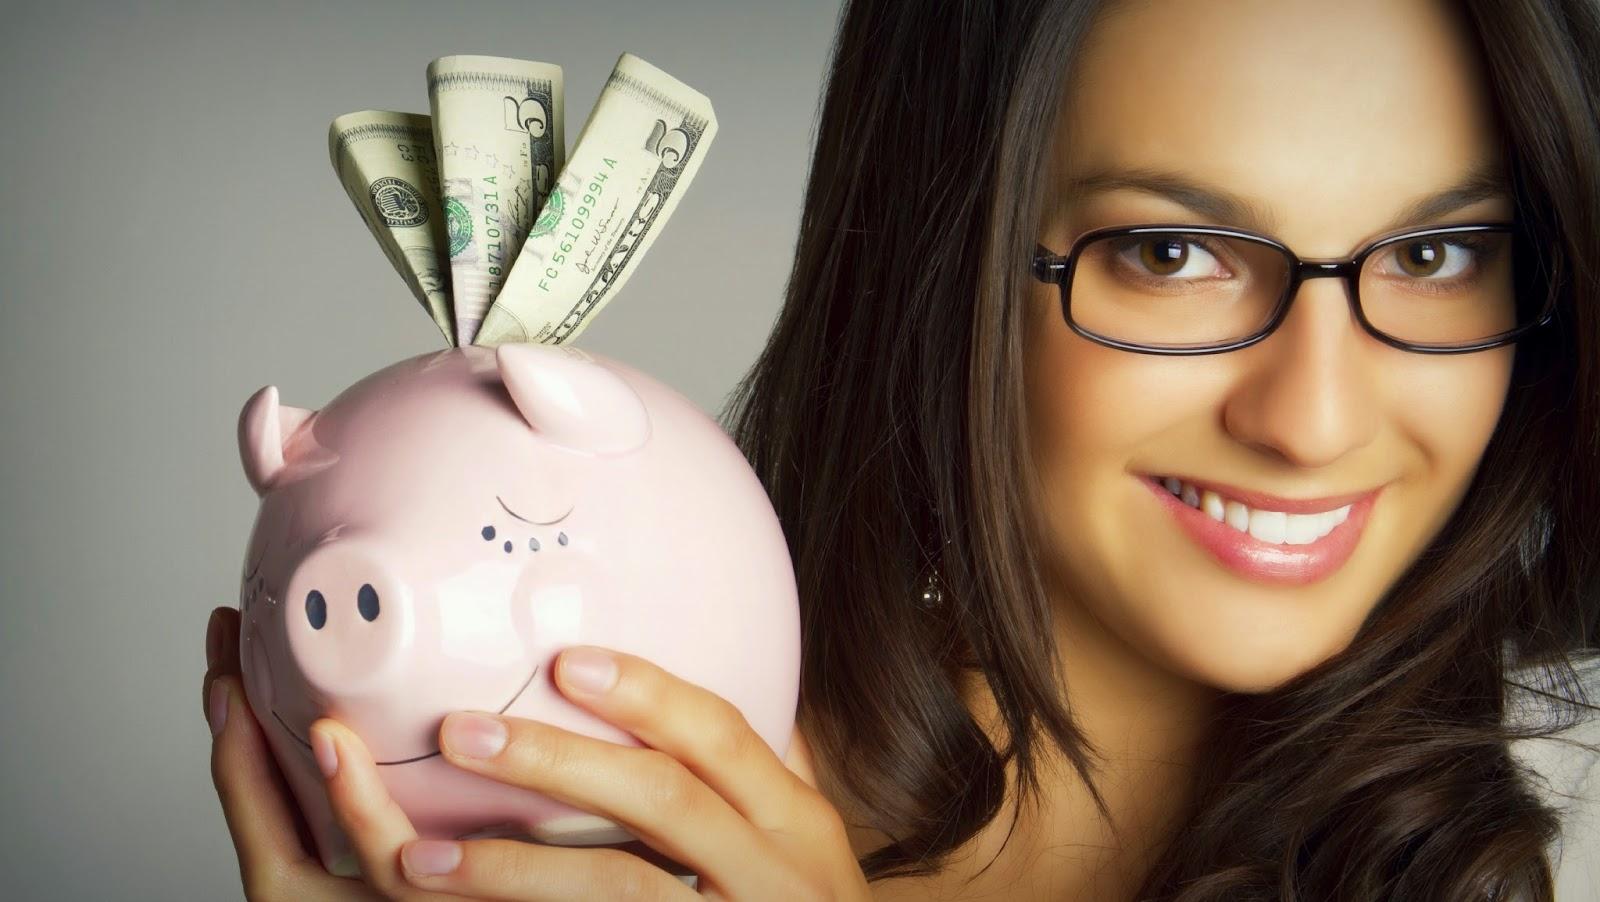 201220141005-cara-menjadi-kaya.jpg